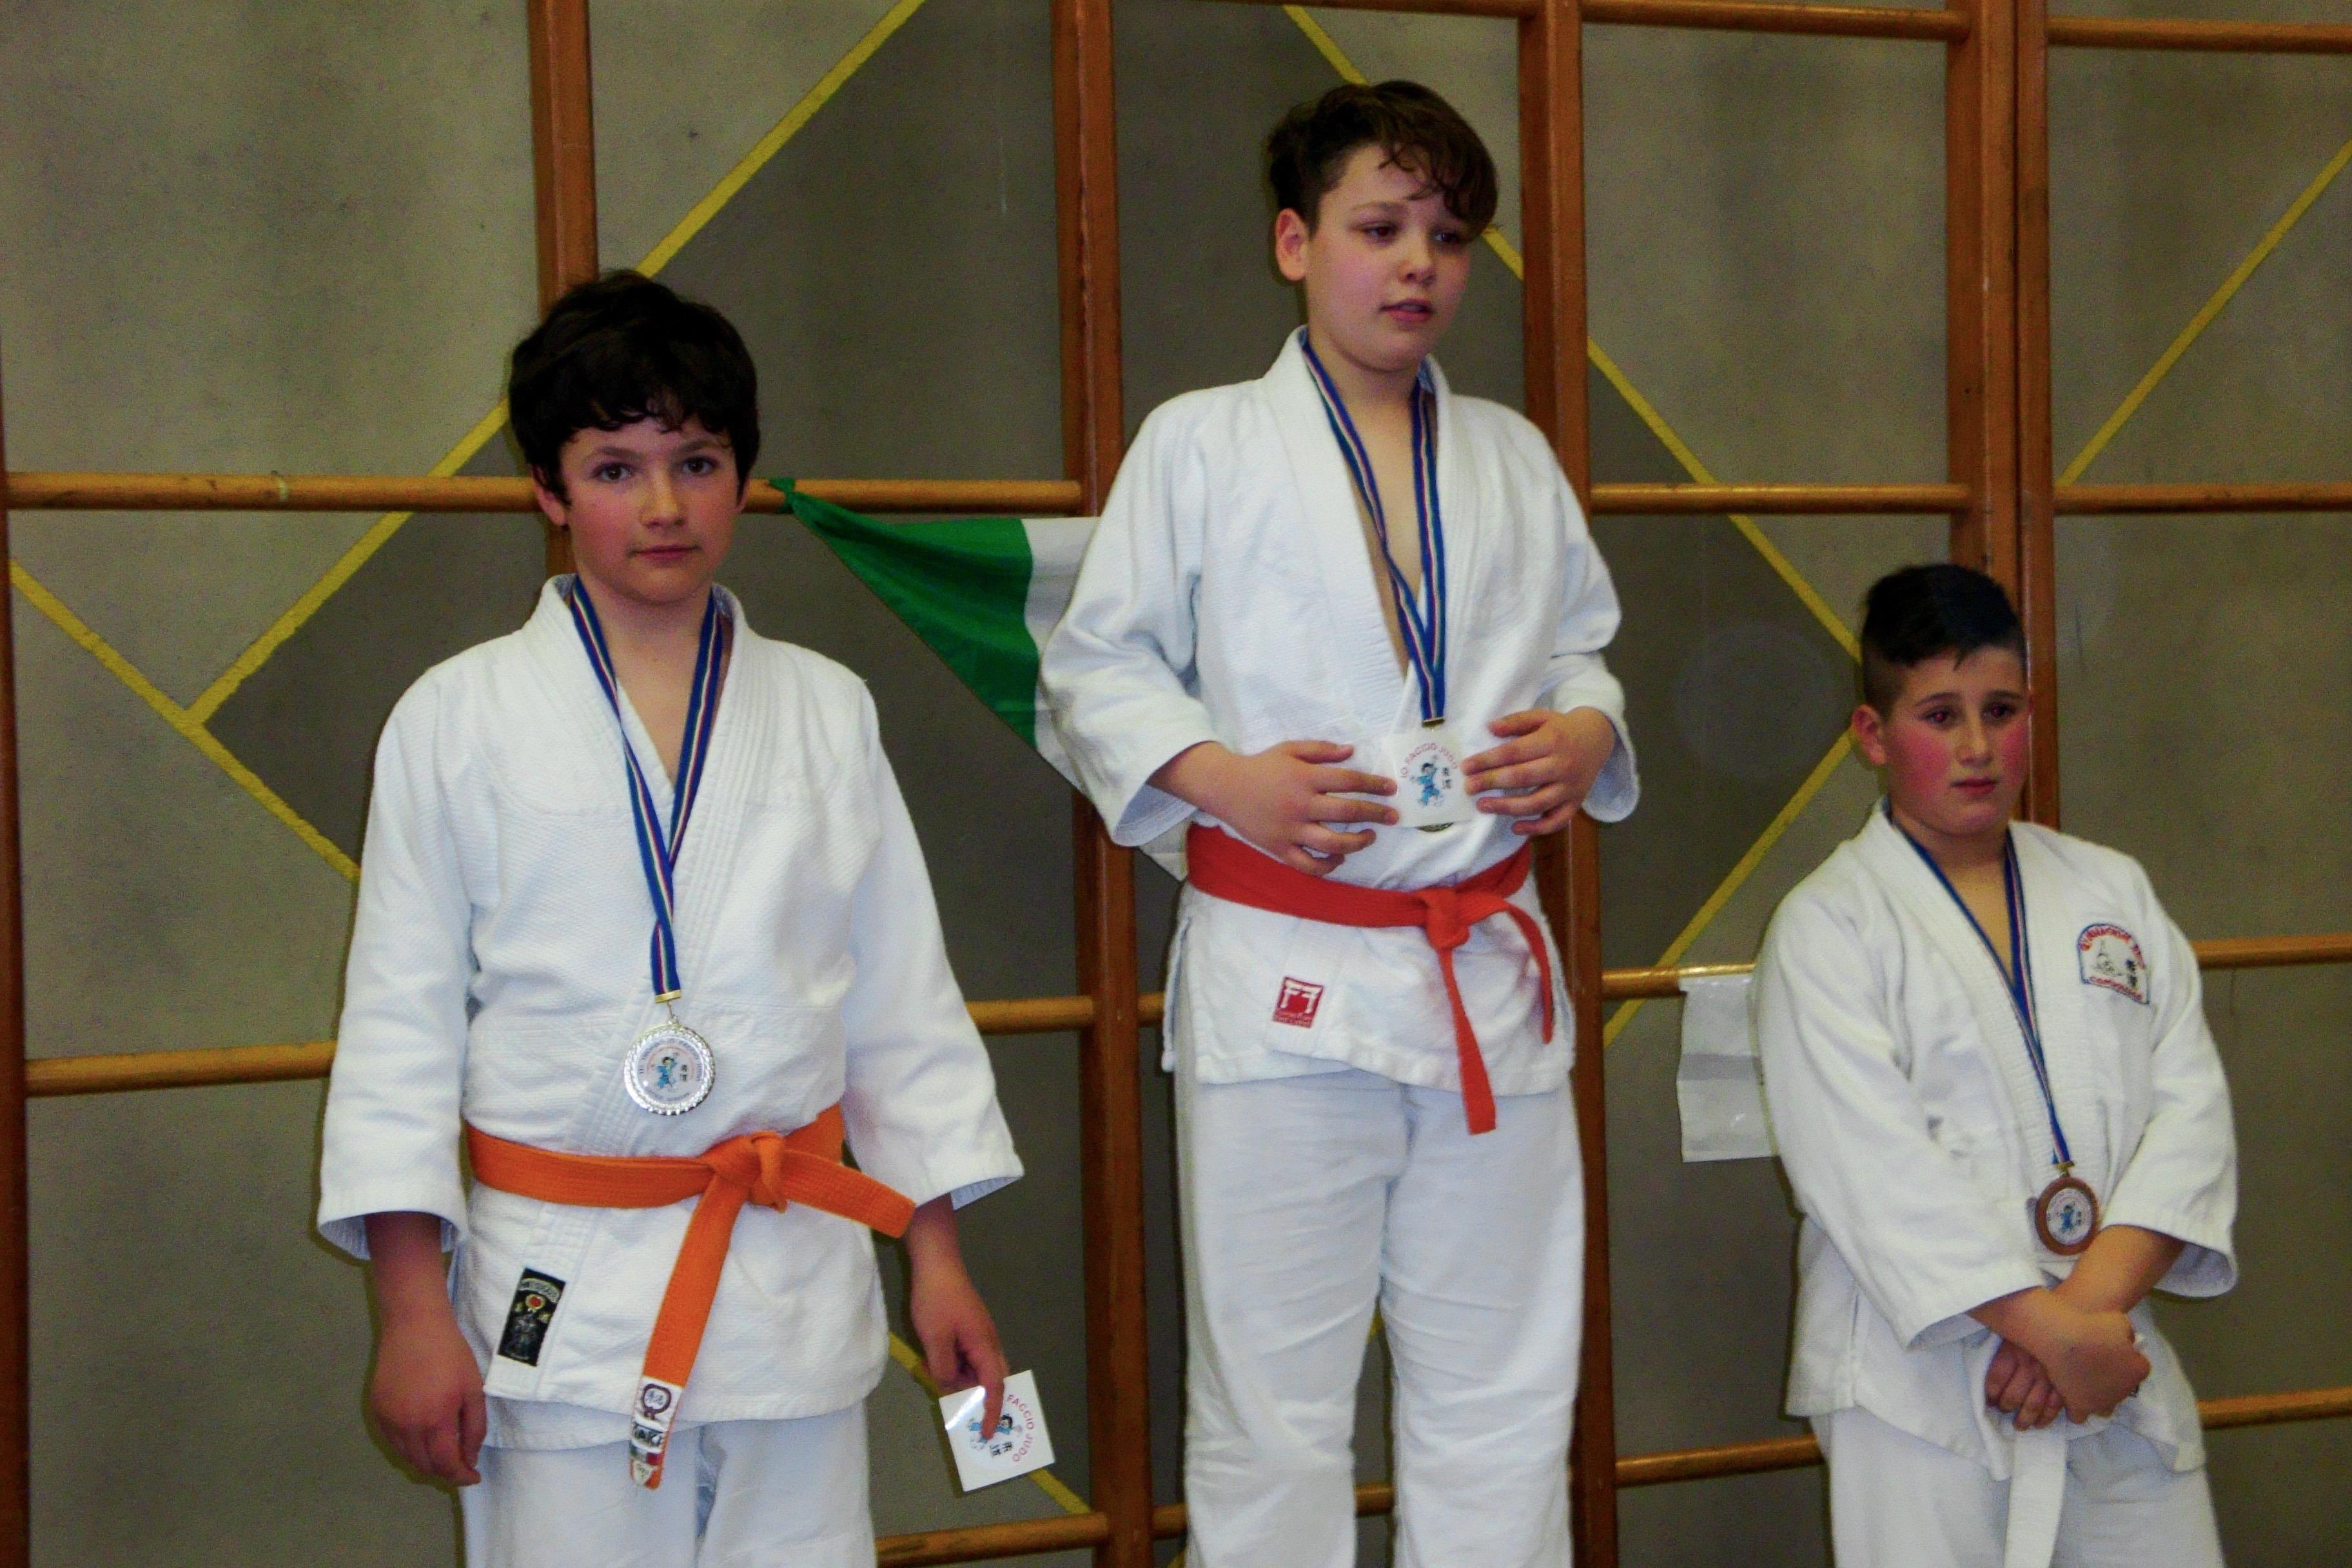 trofeo io faccio Judo + spazioforma Biella